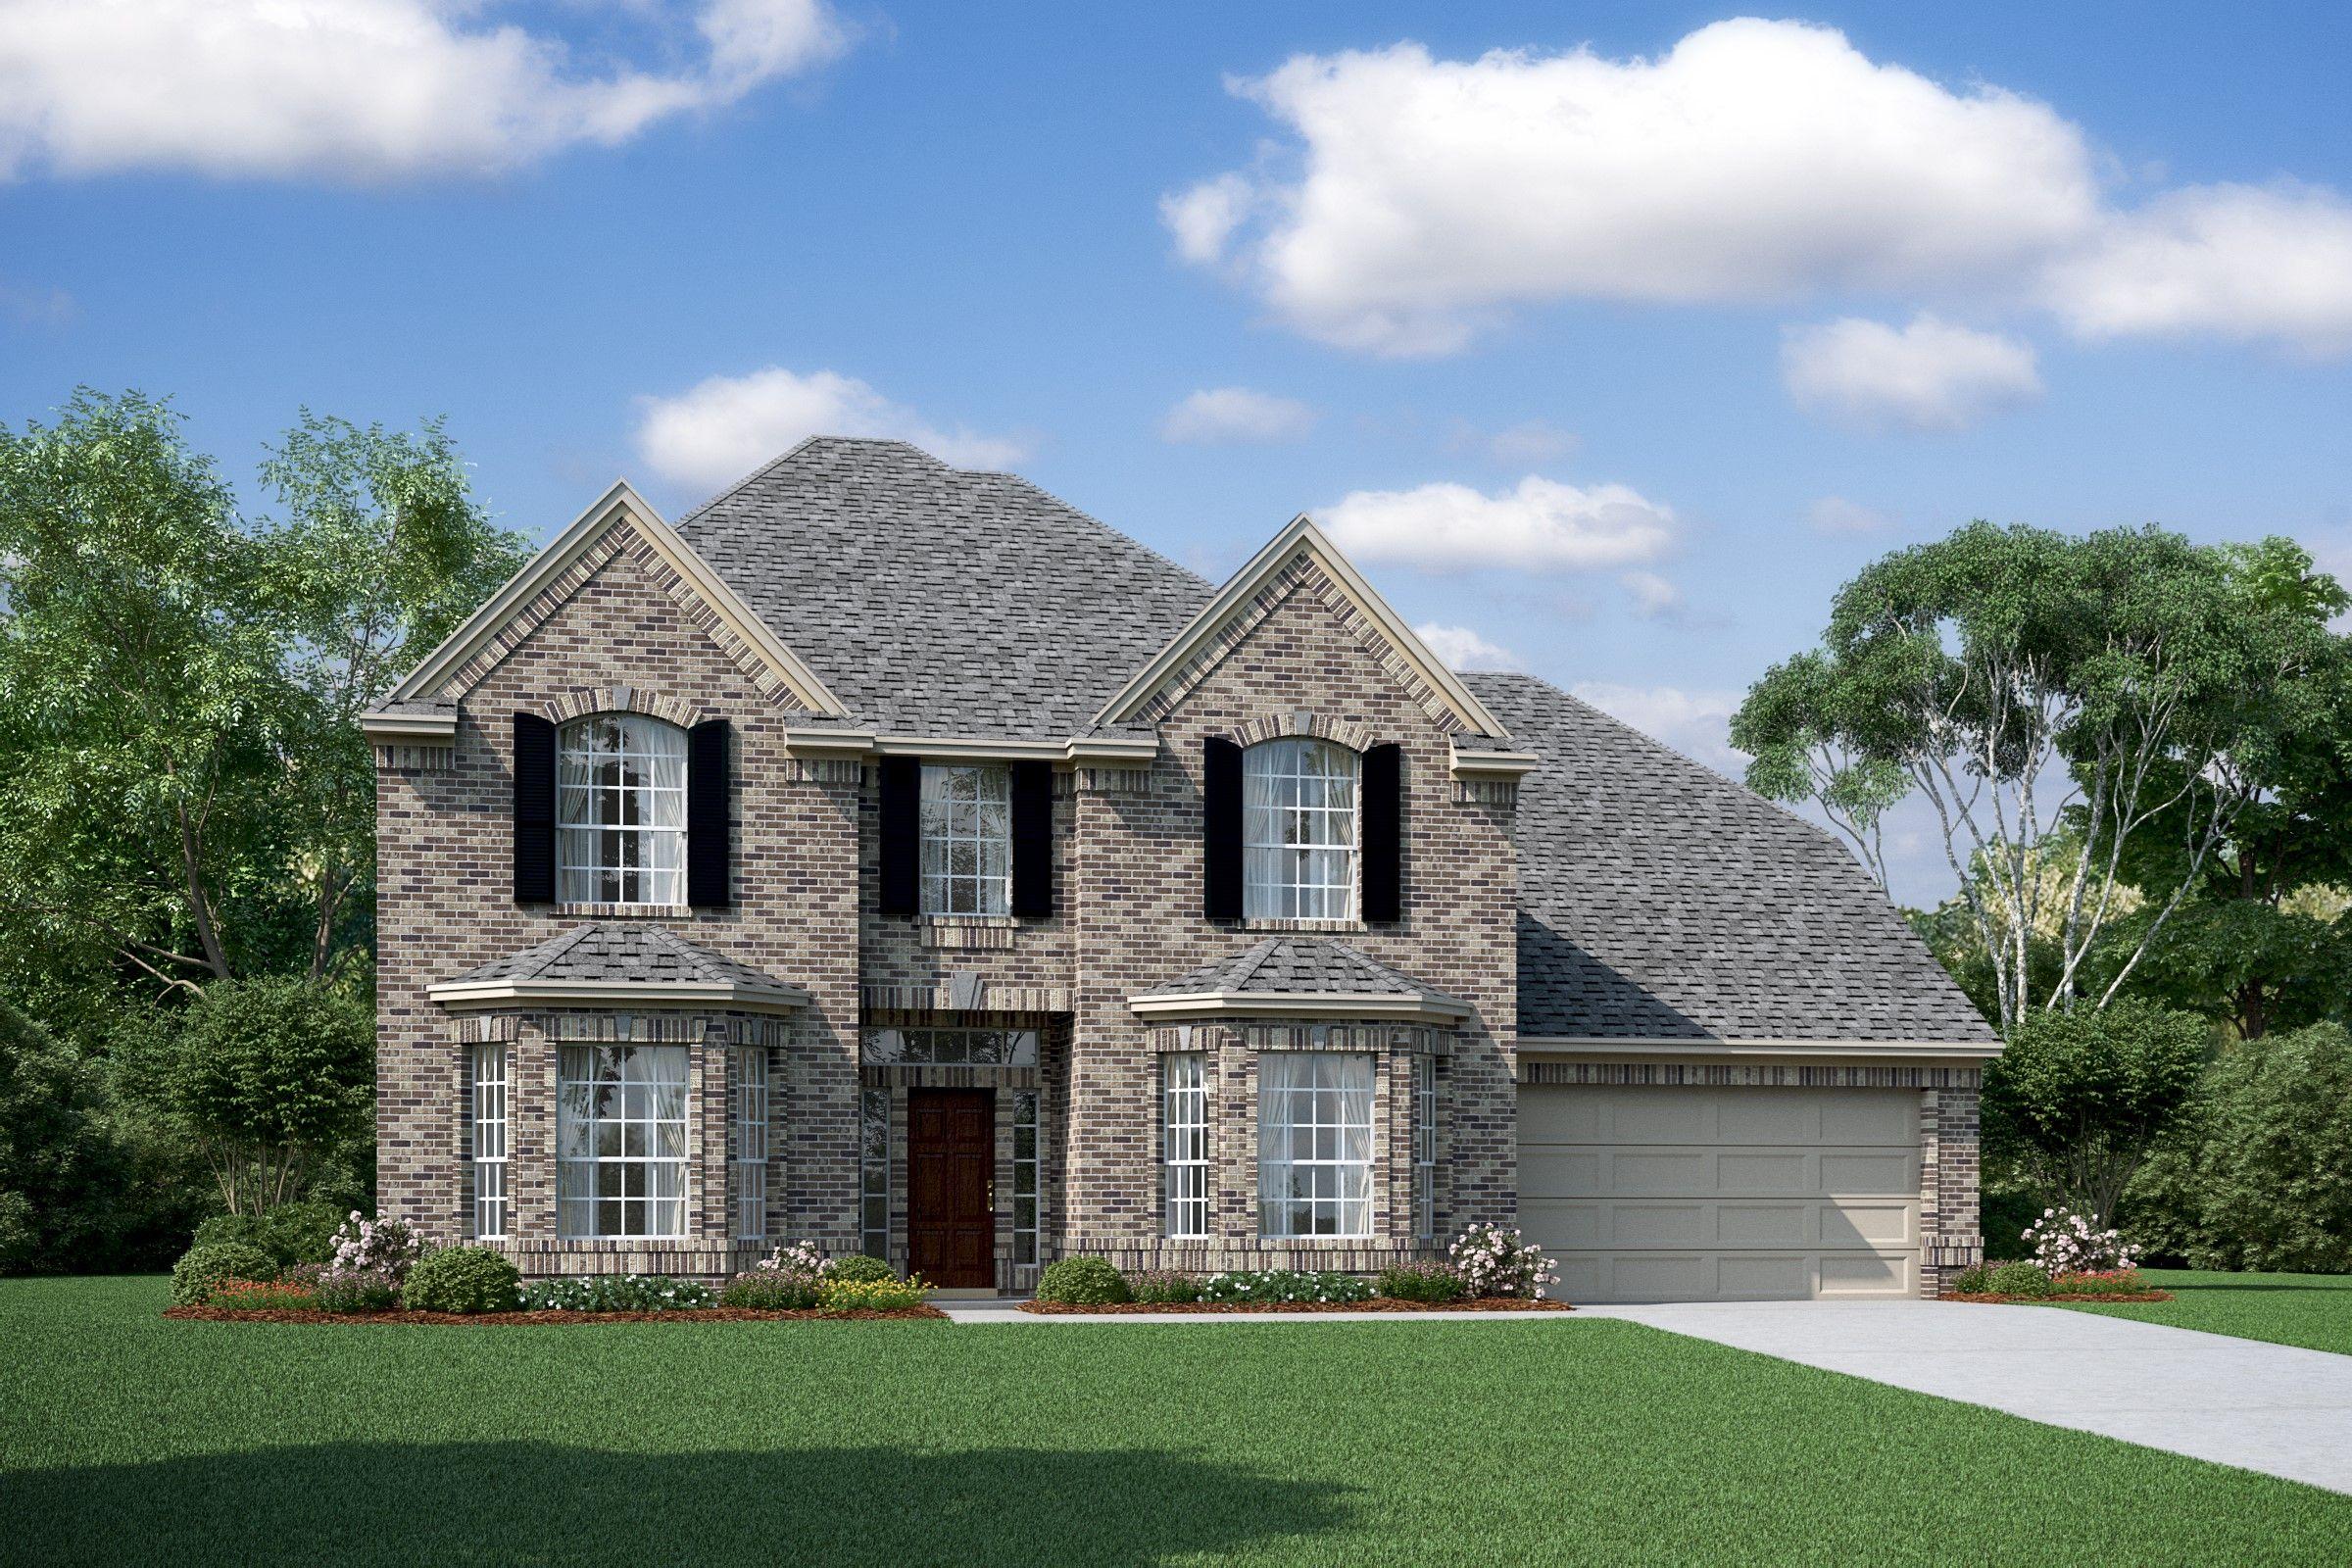 Single Family for Sale at Thunder Bay - Jonathan Mccollum Park Rd & Thunder Bay Beach City, Texas 77523 United States